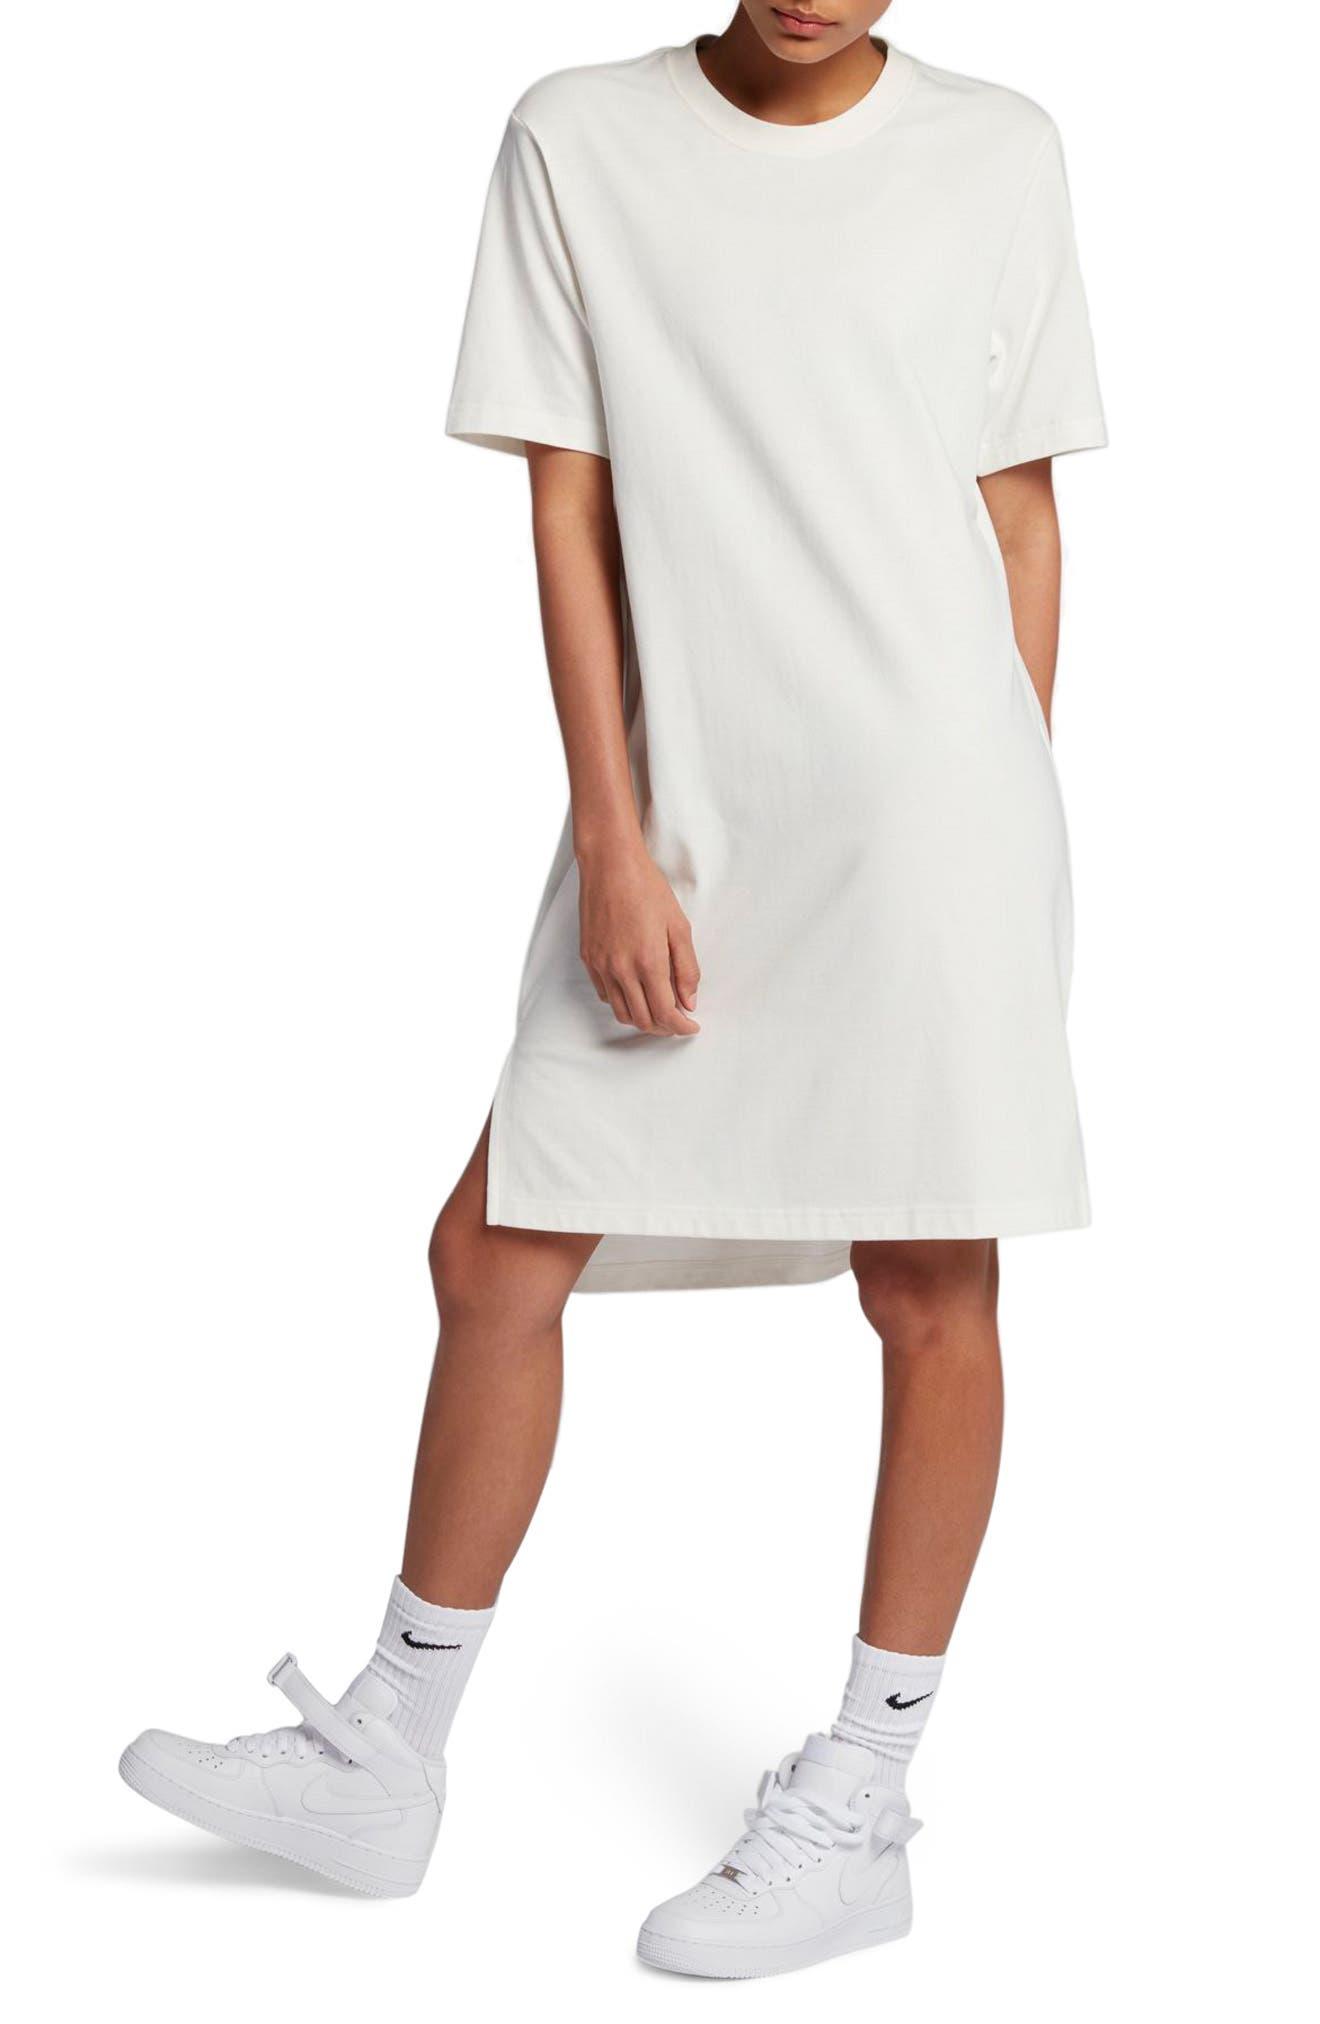 Main Image - Nike NikeLab Essentials T-Shirt Dress